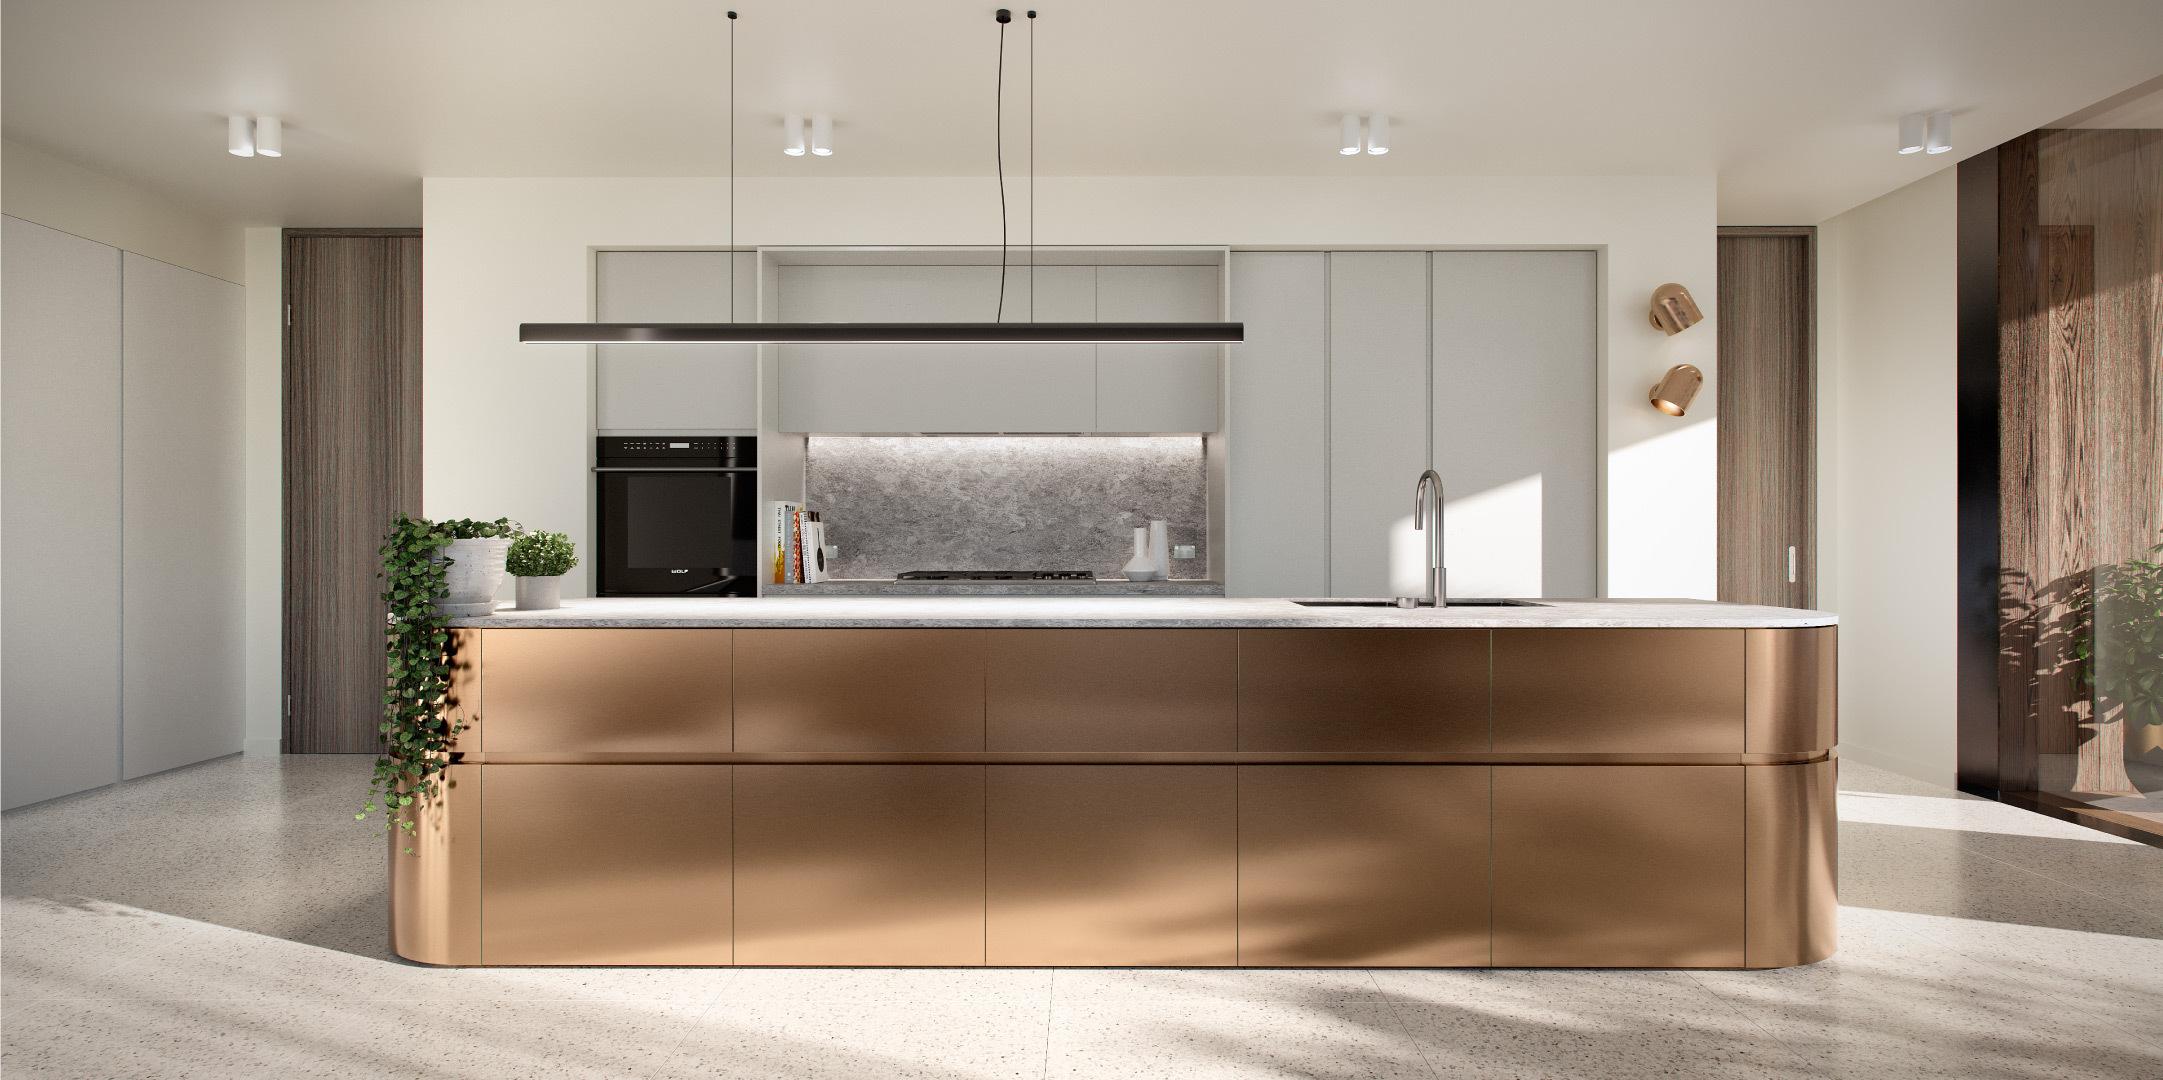 I02_Kitchen_Compressed